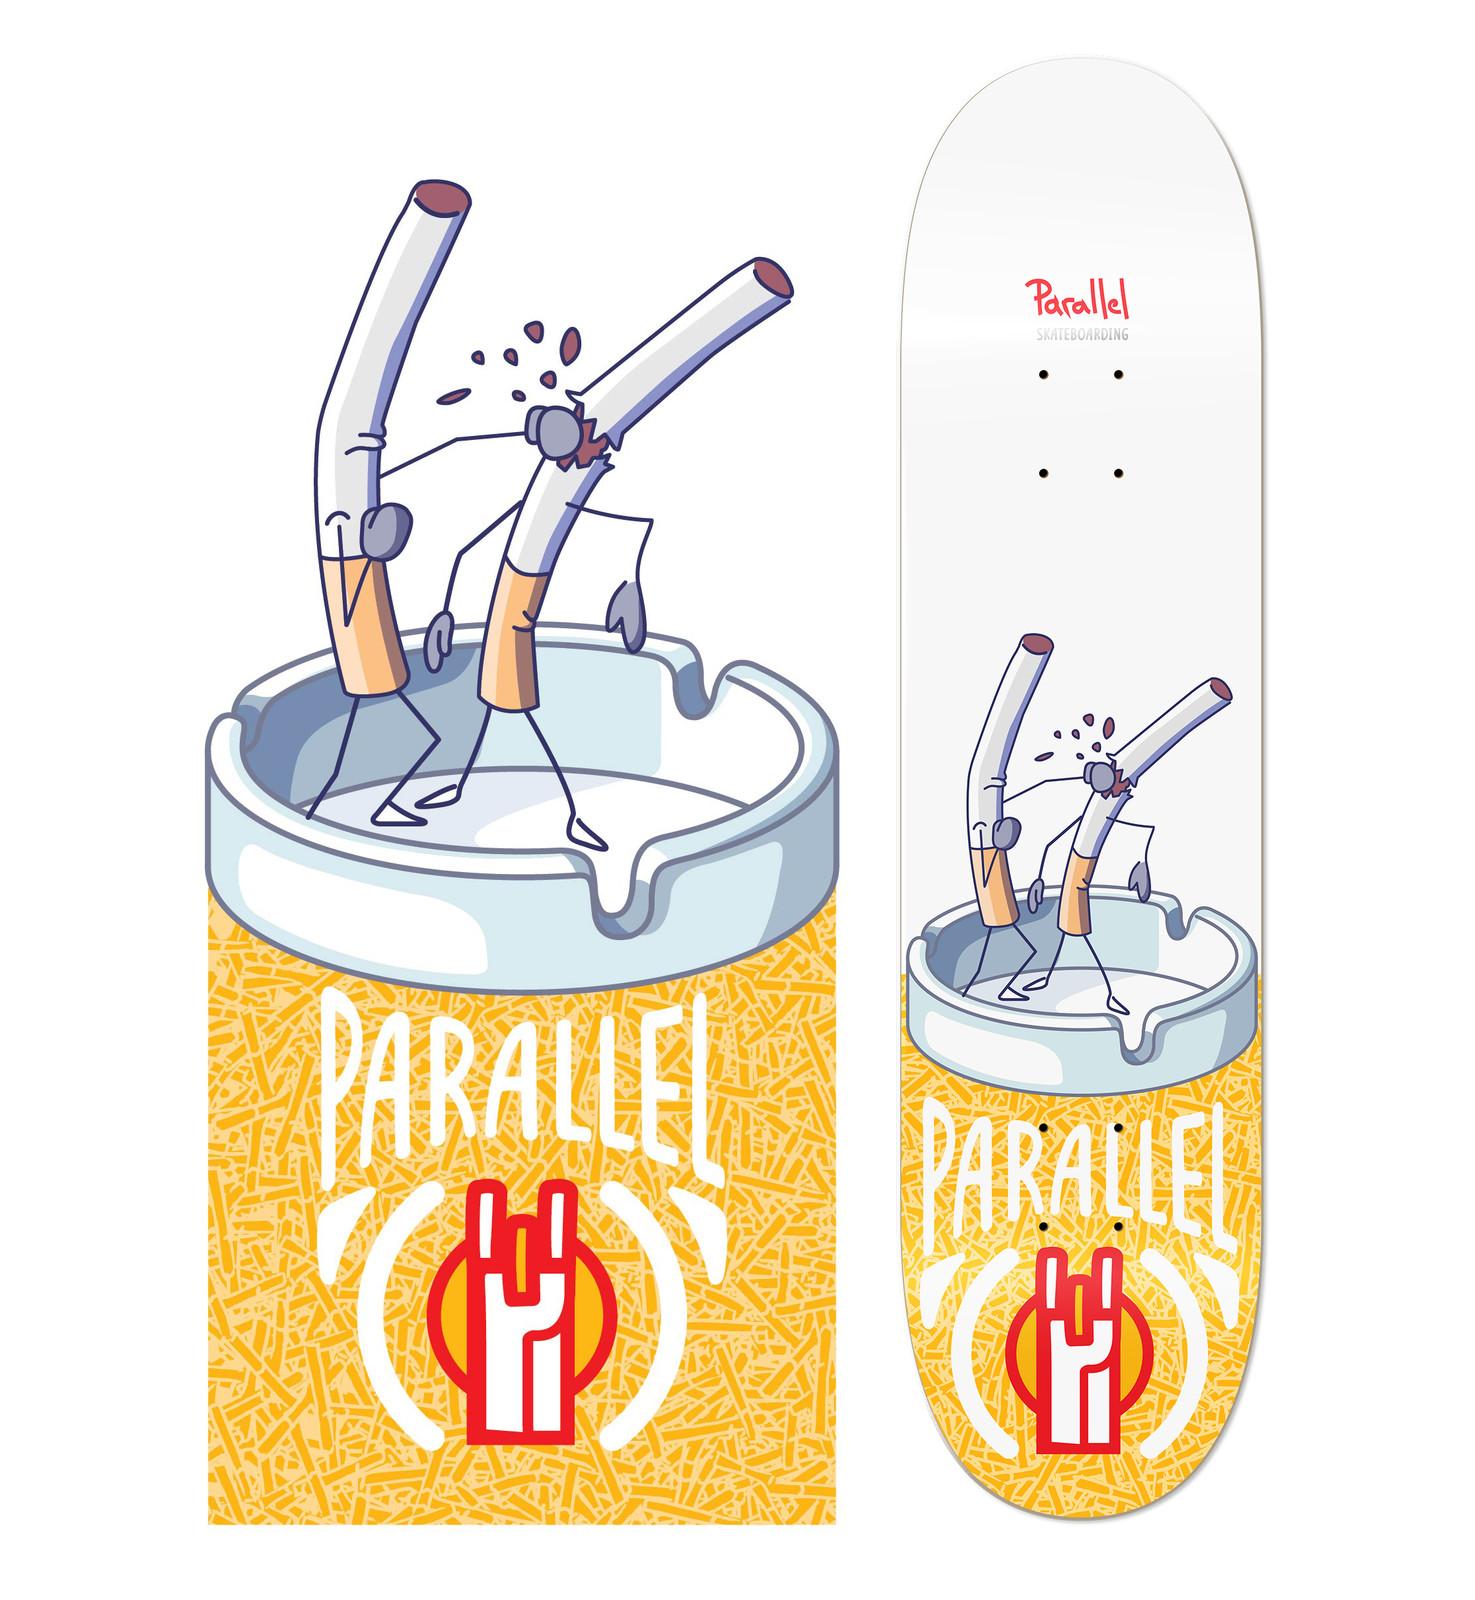 Illustration for skateboard company (Parallel Skateboarding) 2018